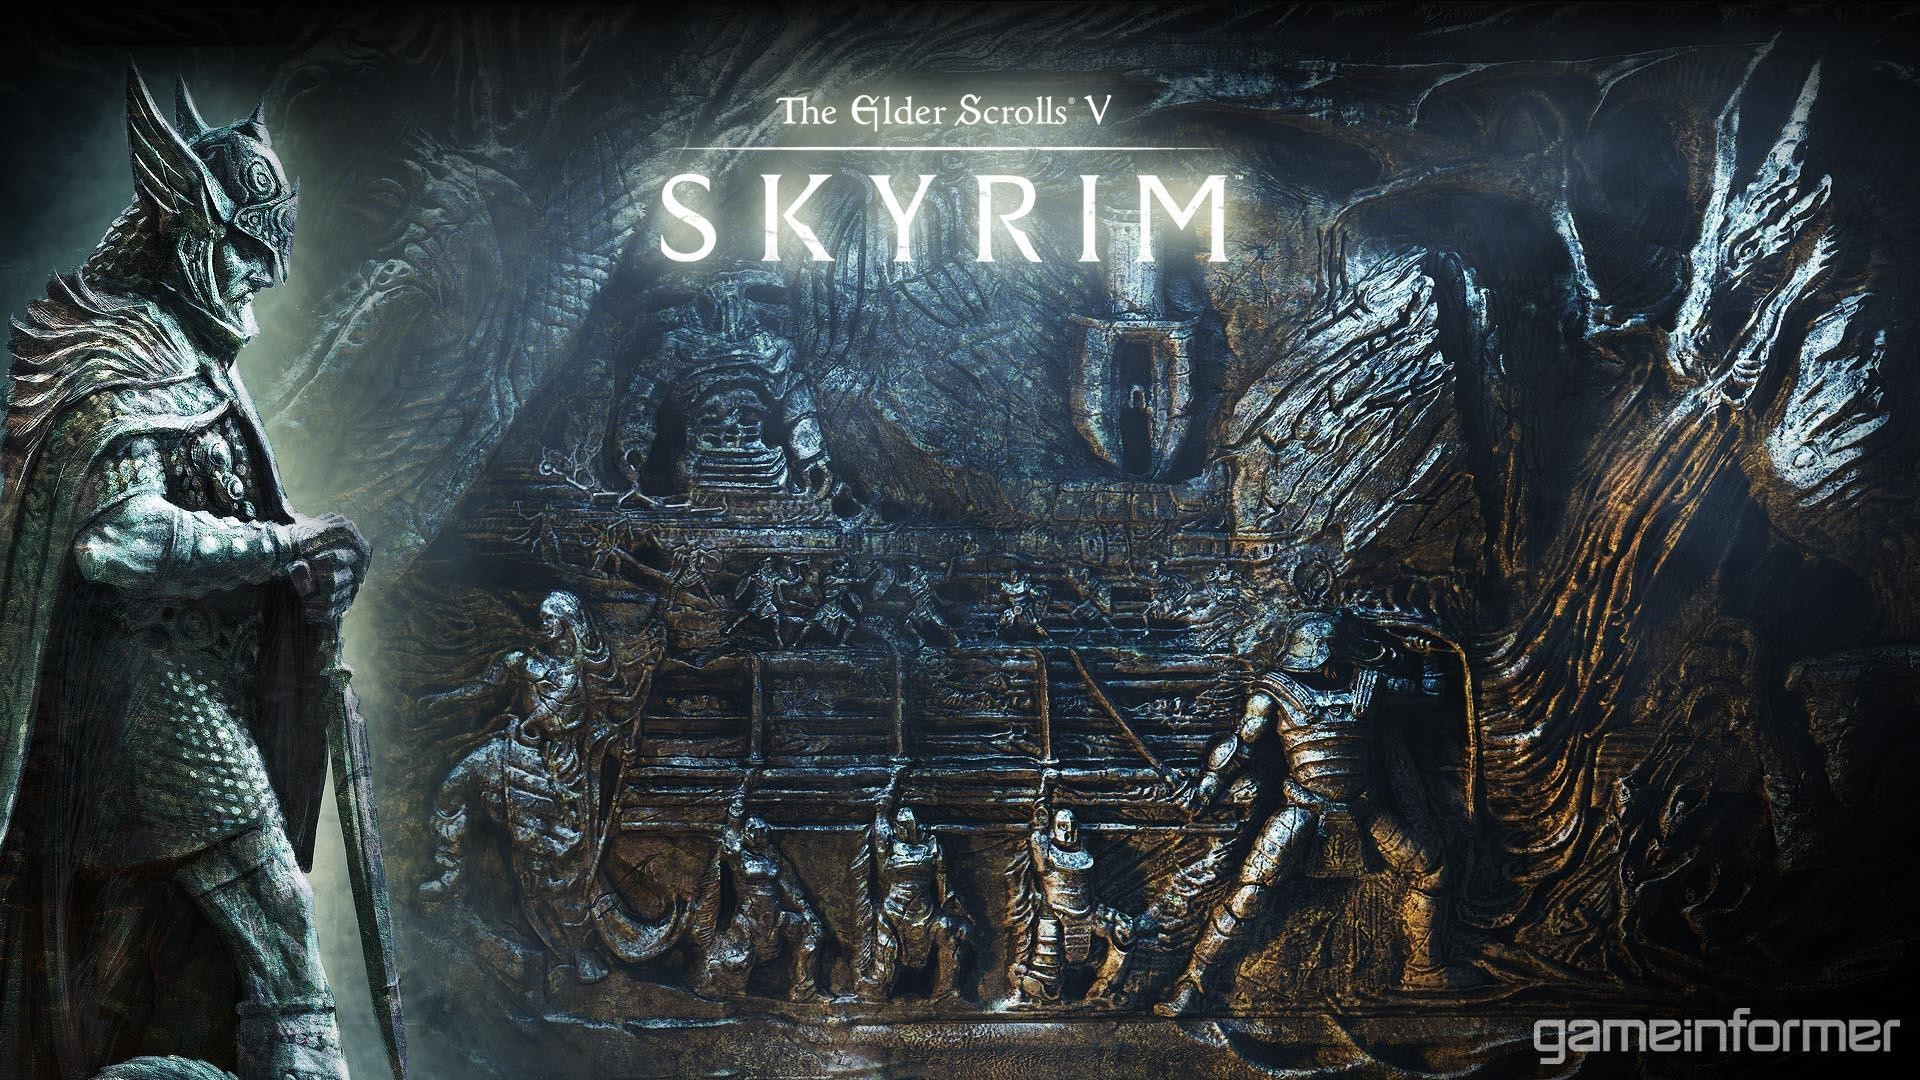 Elder Scrolls V Skyrim Wallpapers in full 1080P HD Â« GamingBolt .